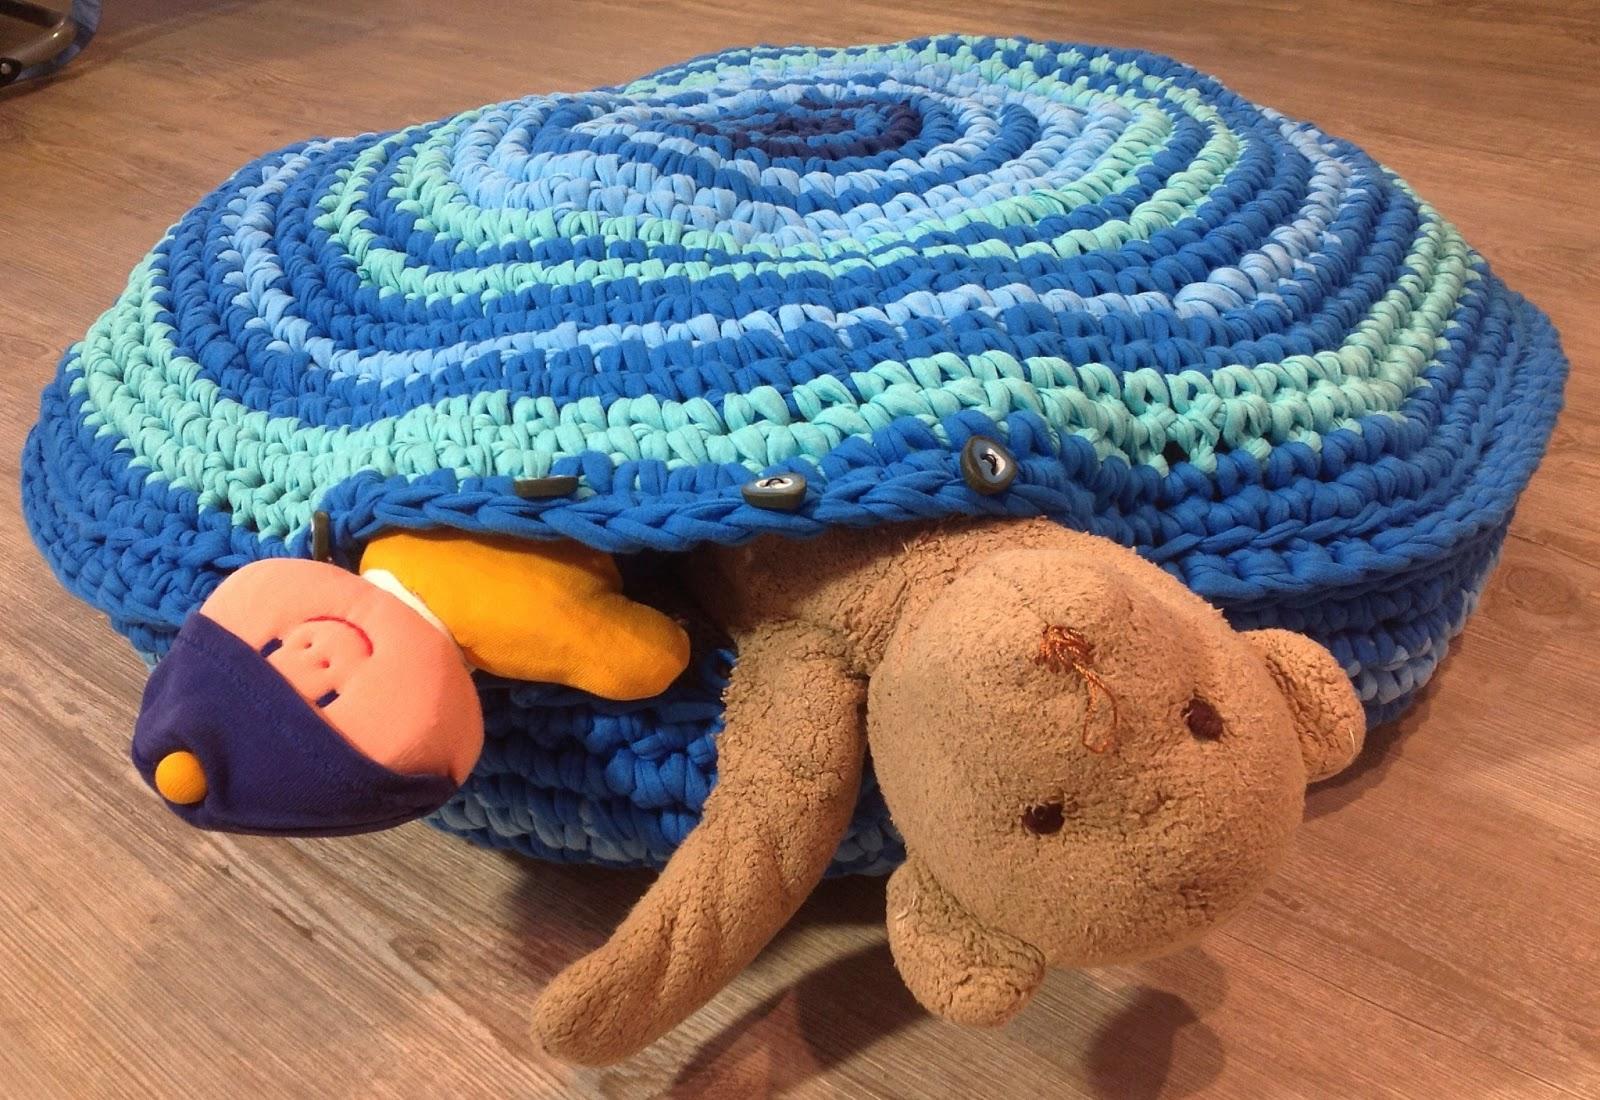 Shimi El Blog De Trapillo Com P Gina 2 -> Tapetes Para Sala Tejidos A Crochet